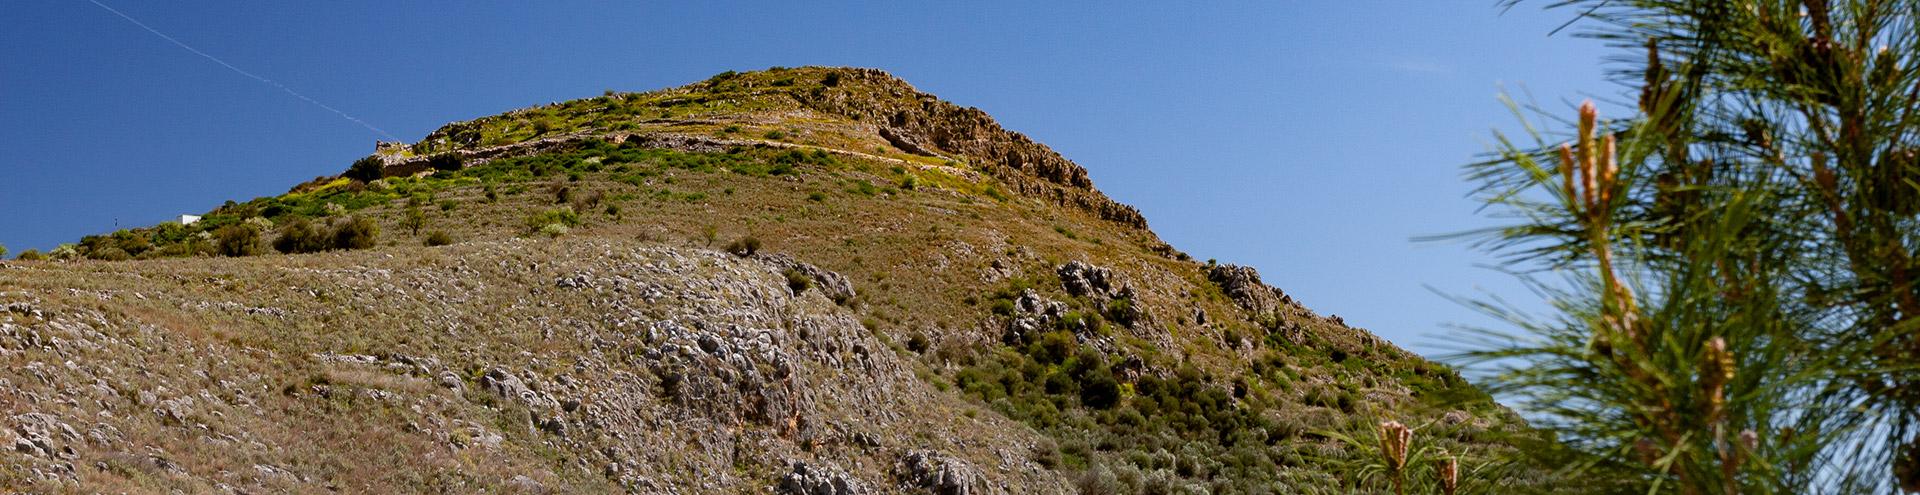 Die mykenische Akropolis Midea